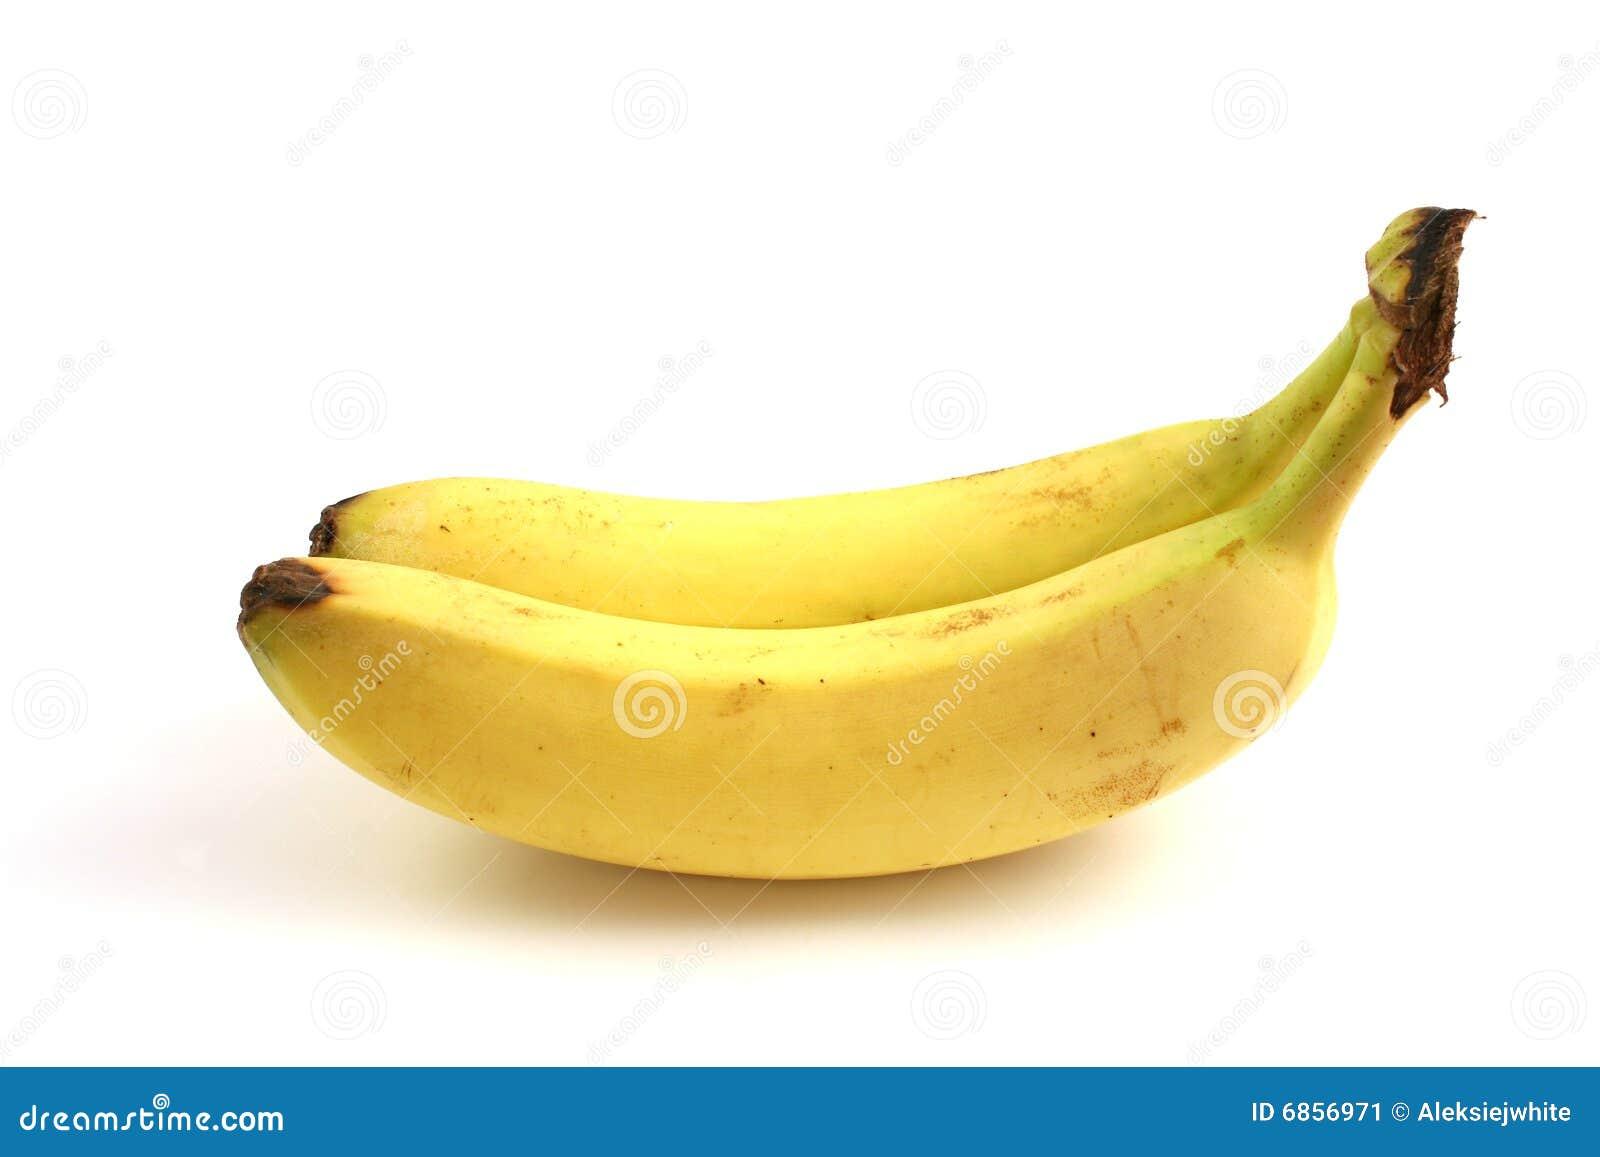 Two bananas up my fuck holes 9